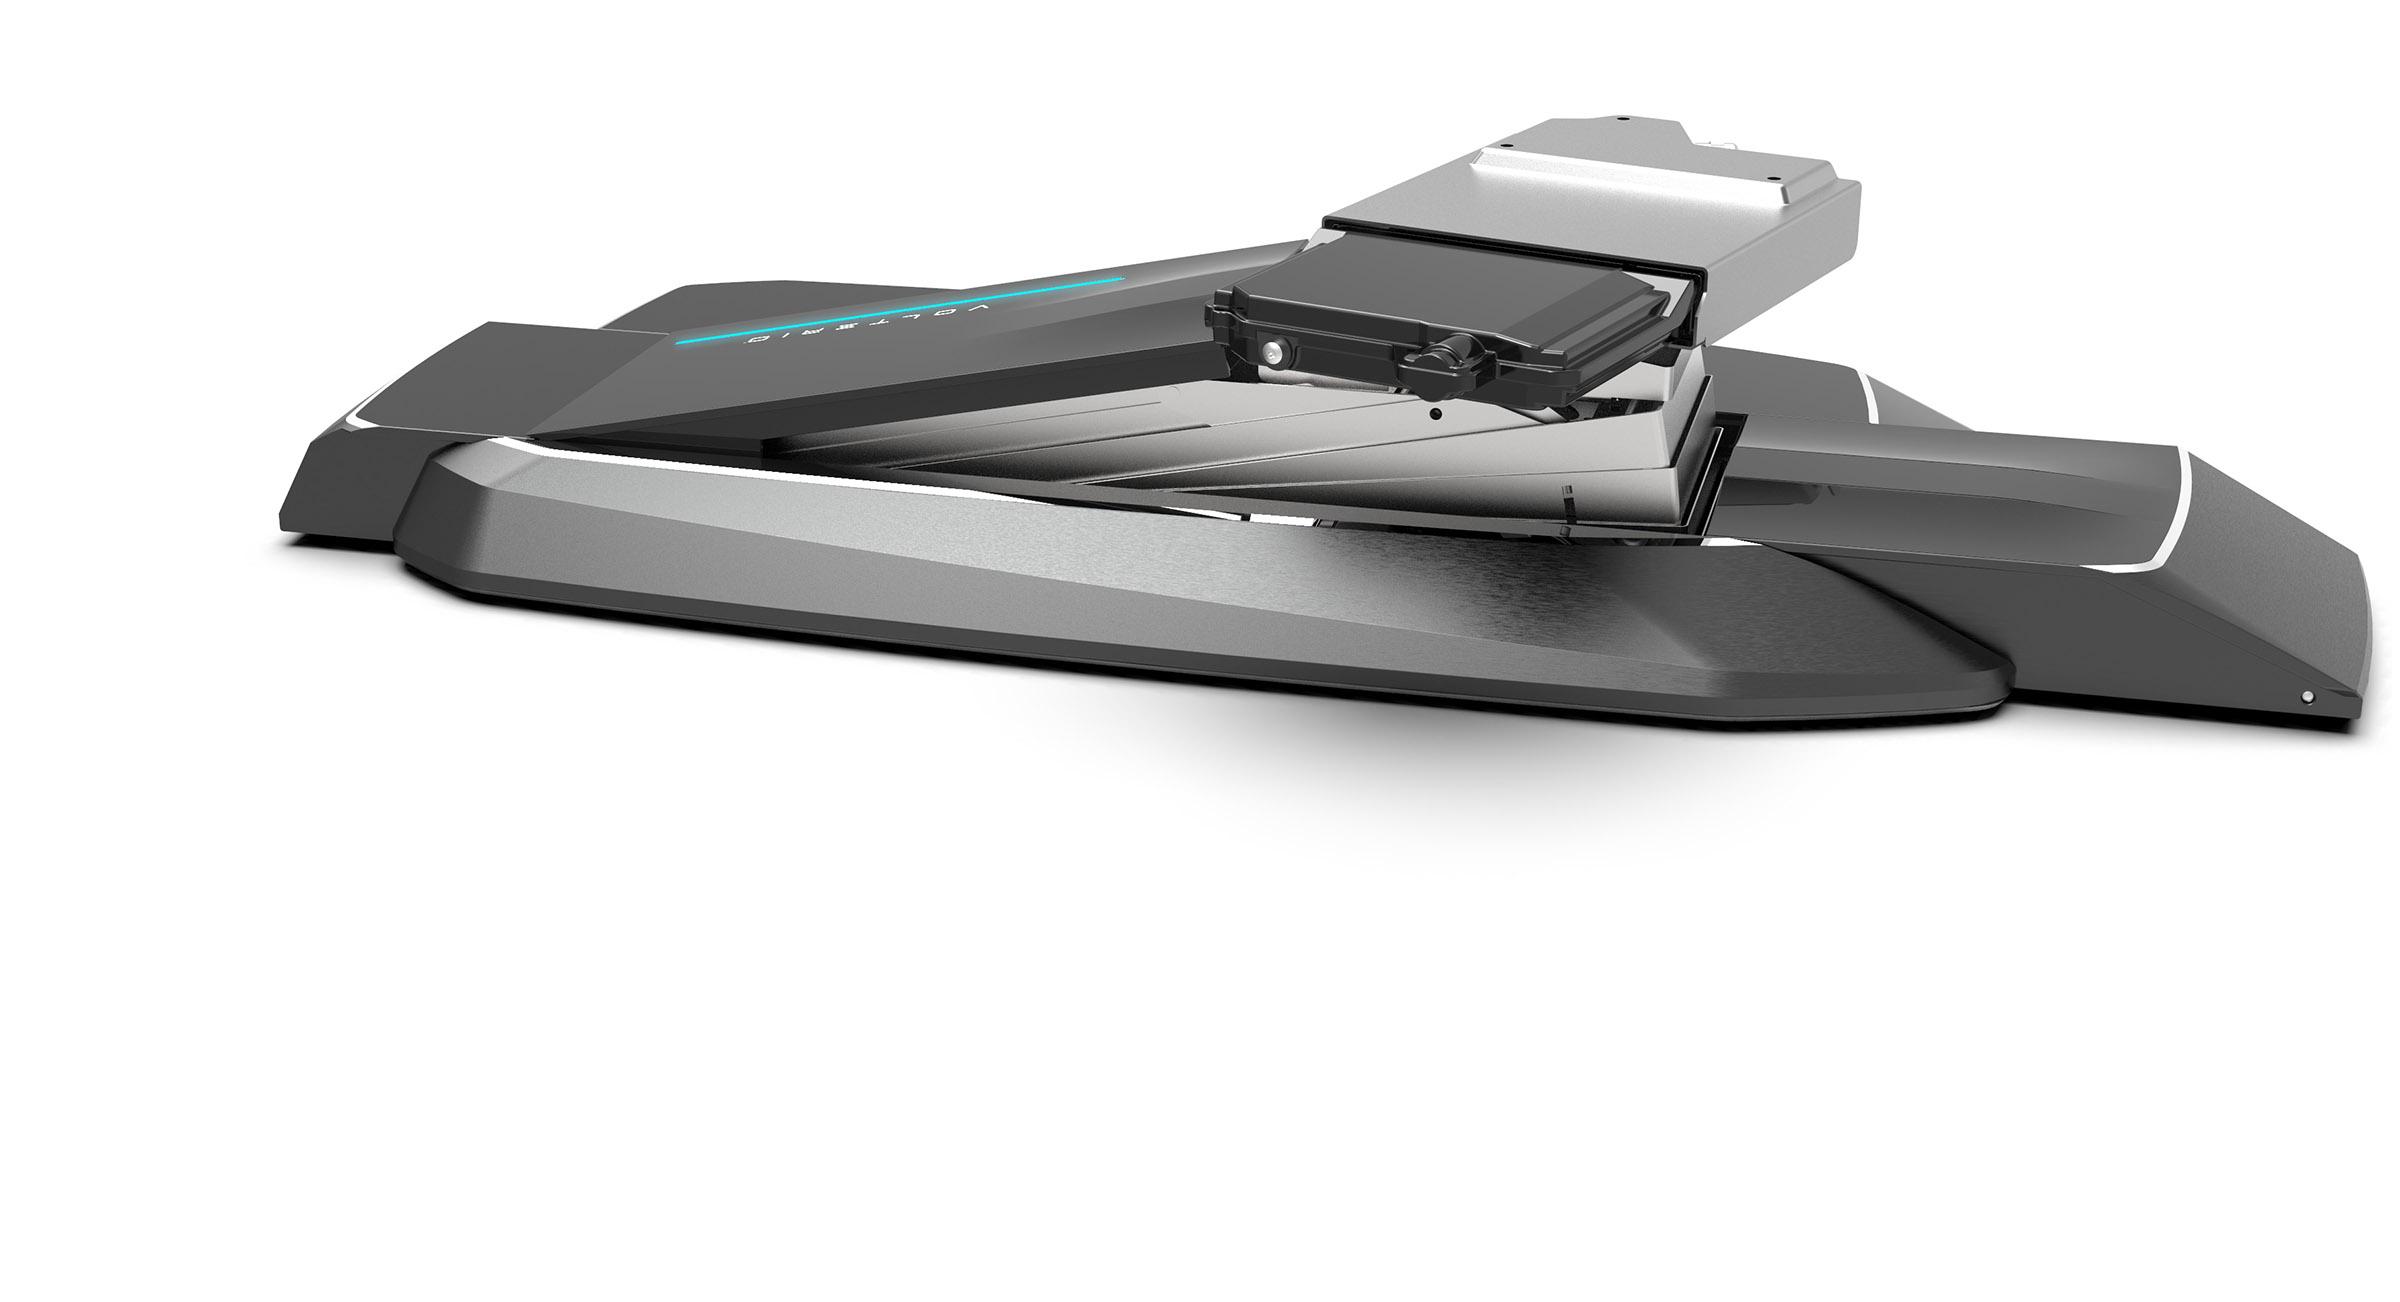 Volterio Inova na forma de Carregar Carro Elétrico. Carregador de carro elétrico